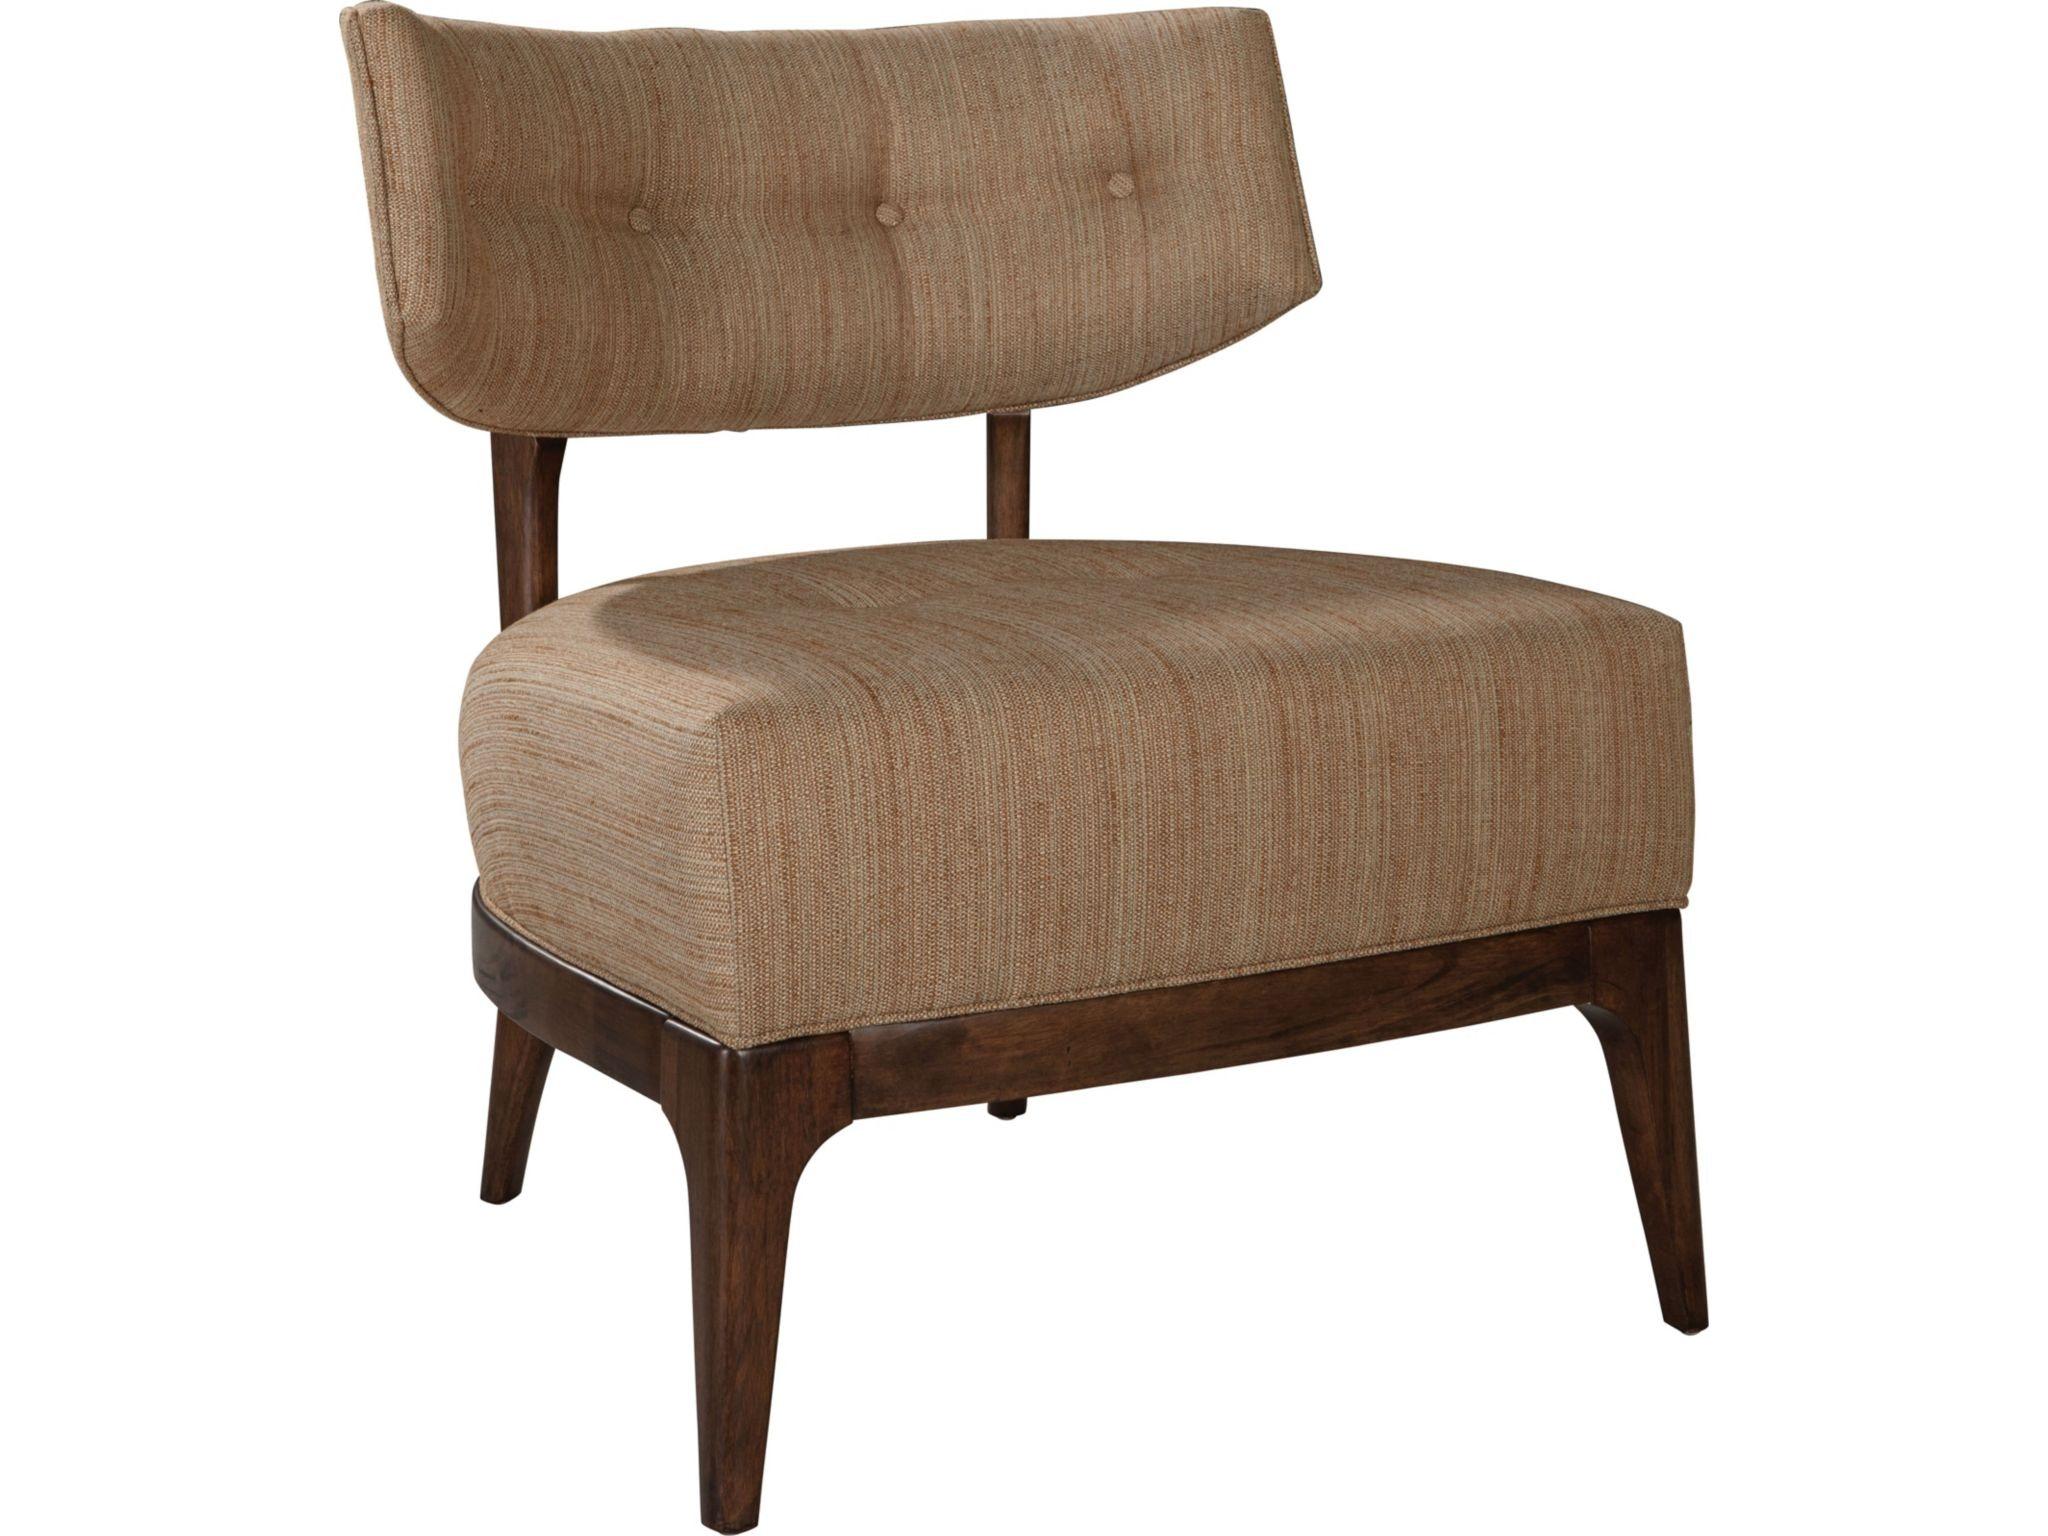 Thomasville Living Room Stradella Chair